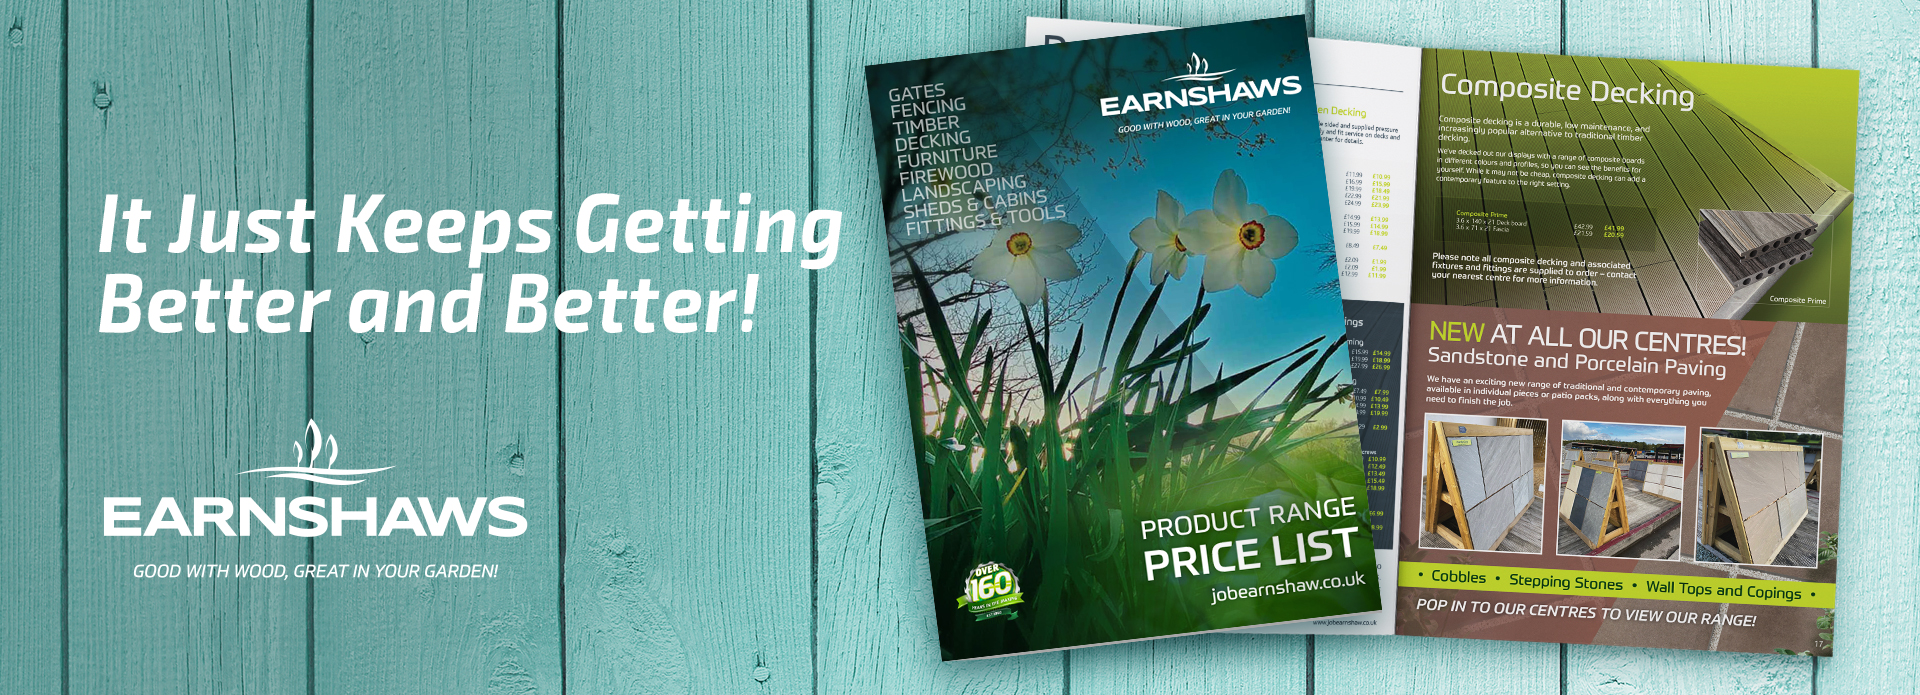 Earnshaws Price List 2021 – Fifteen Years of Evolution